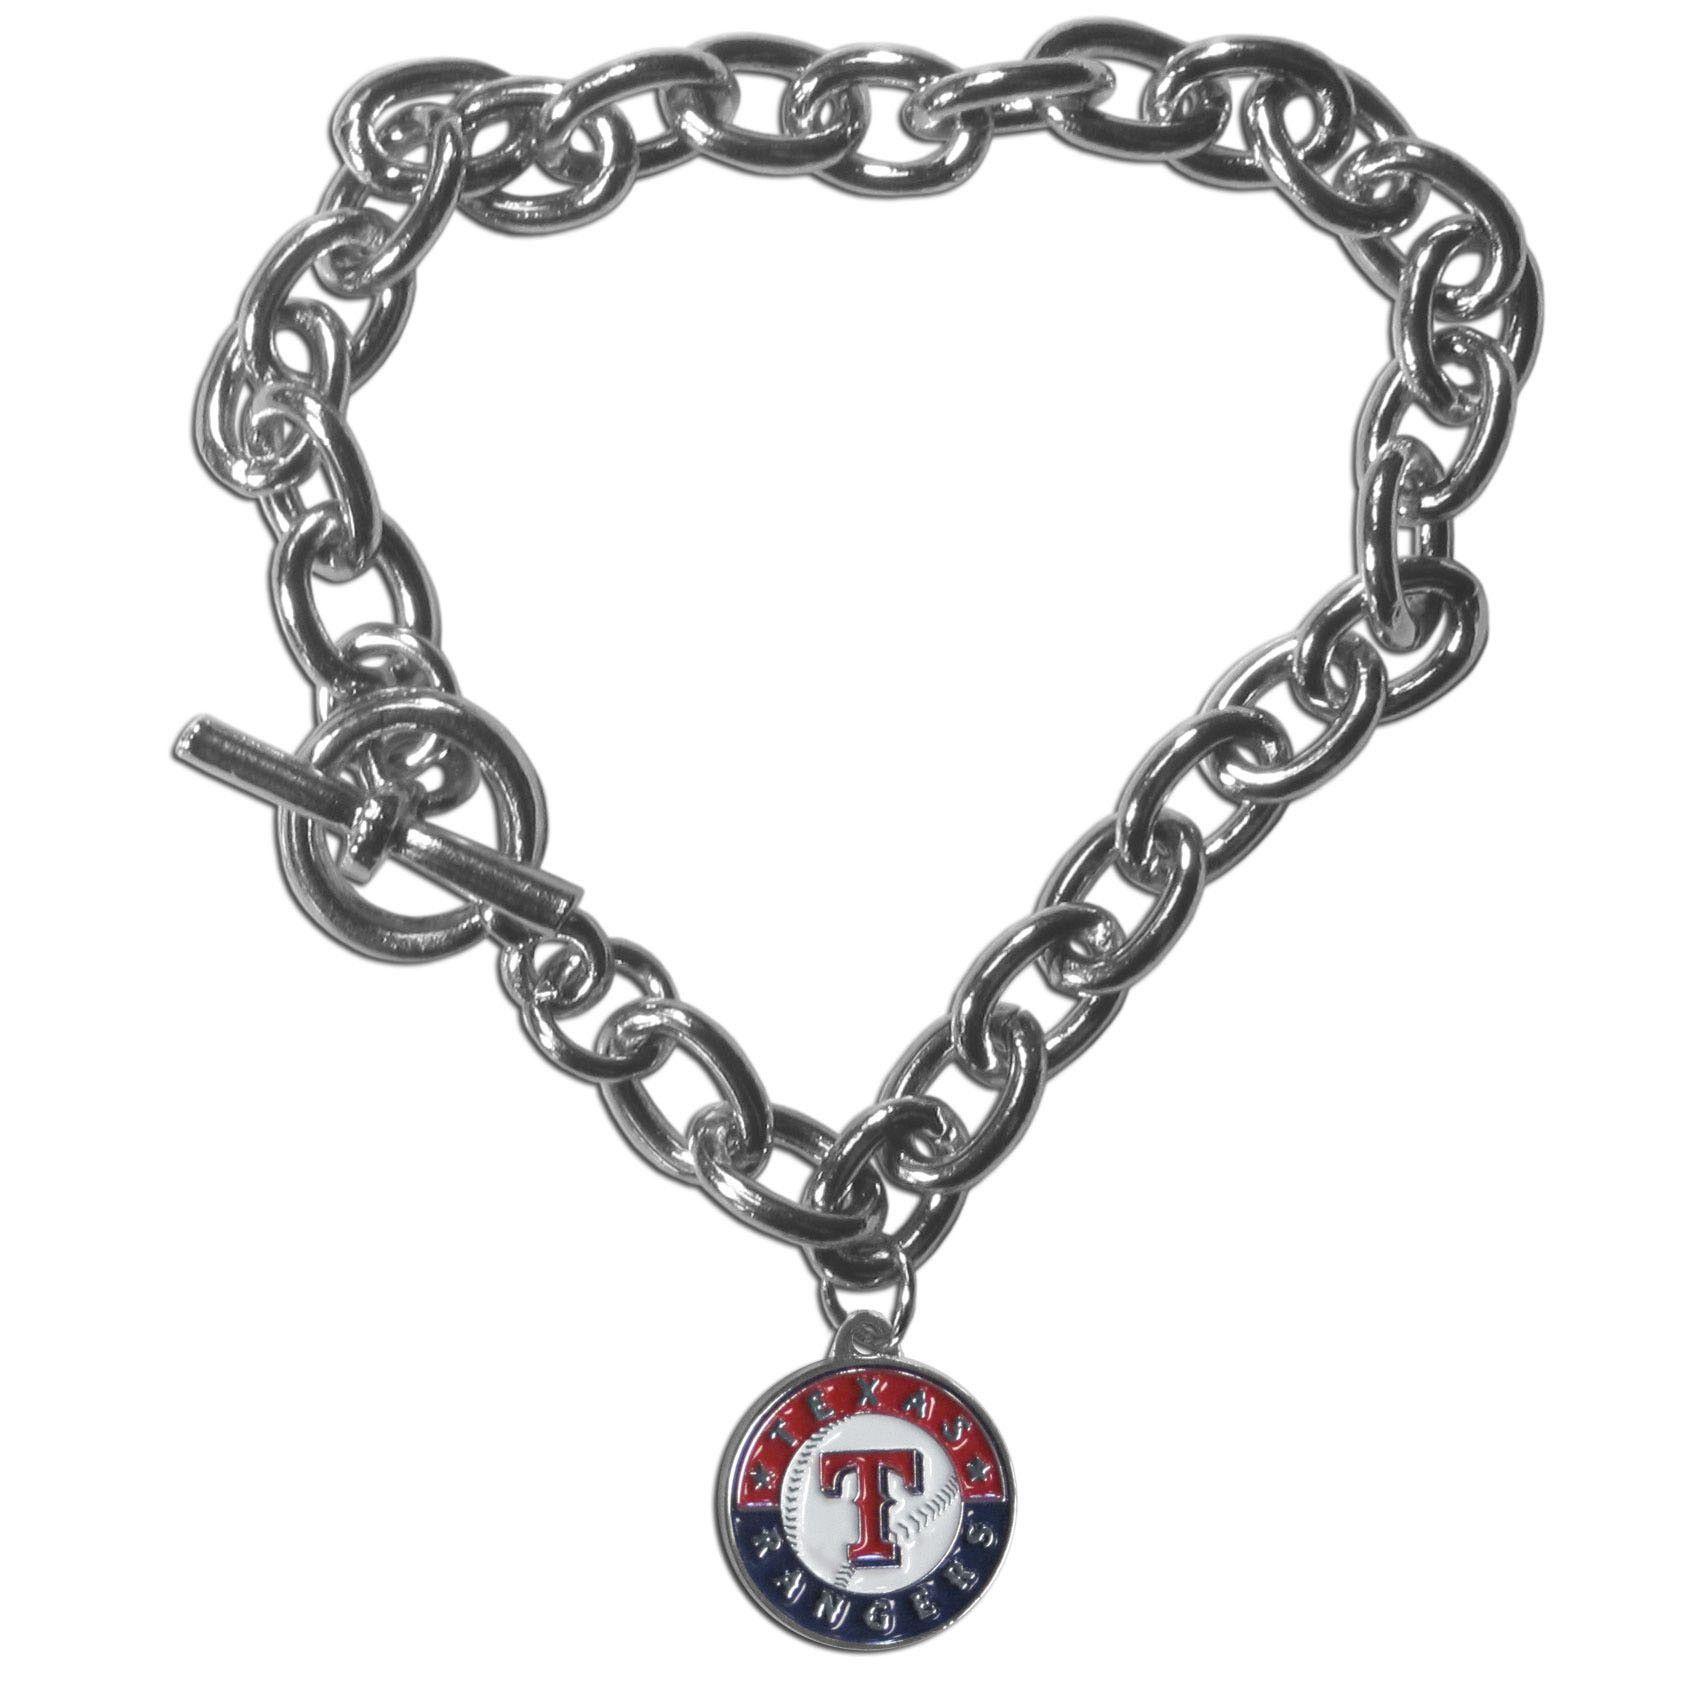 Texas Rangers Charm Chain Bracelet